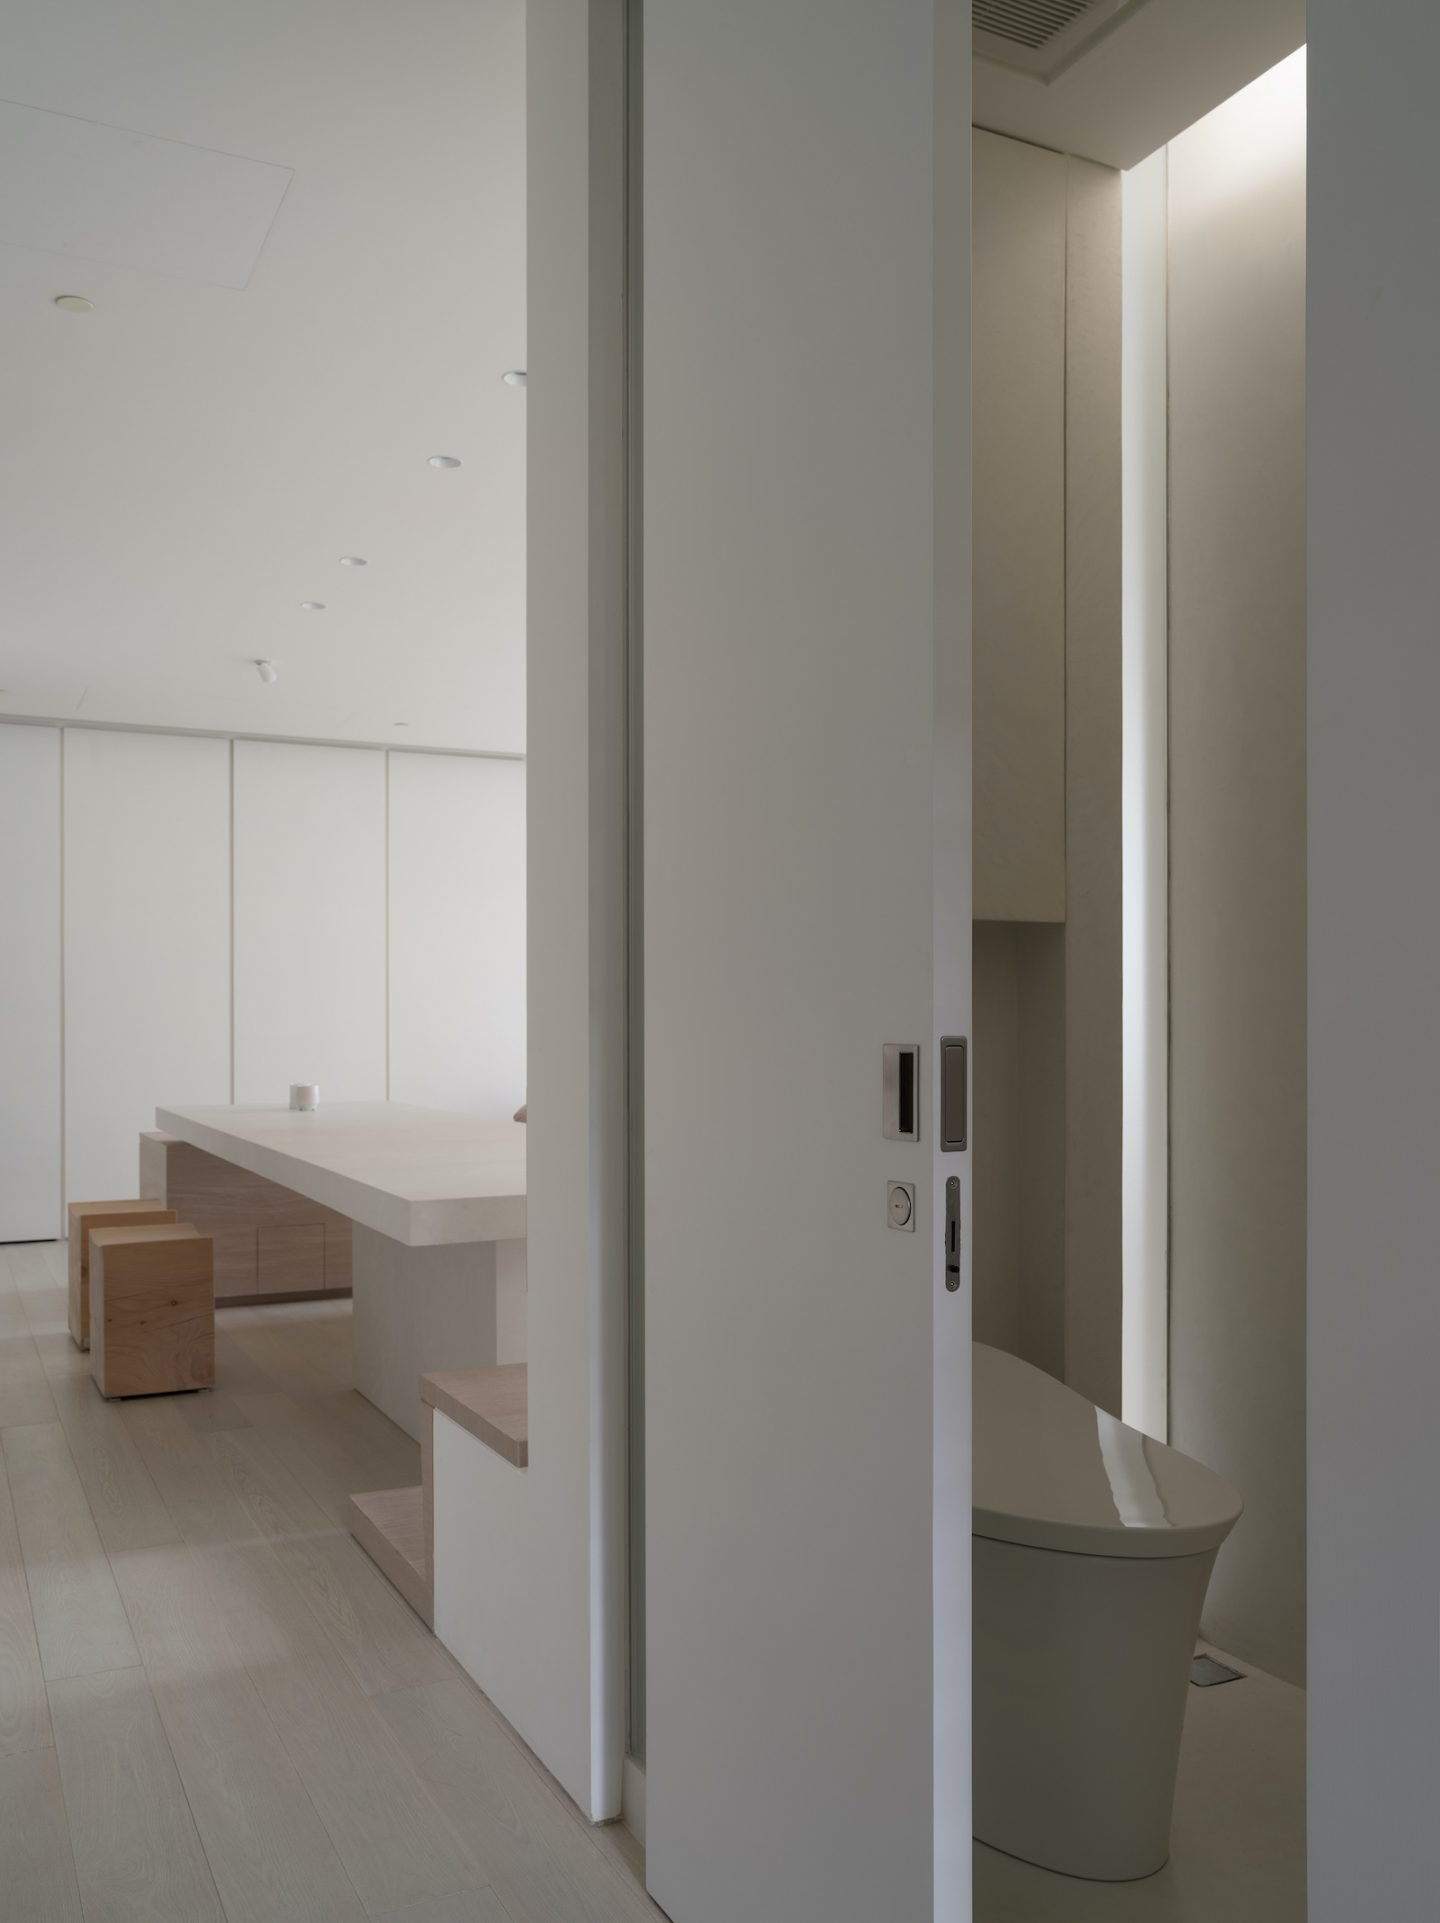 IGNANT-Architecture-Marty-Chou-KOA-Apartment-010